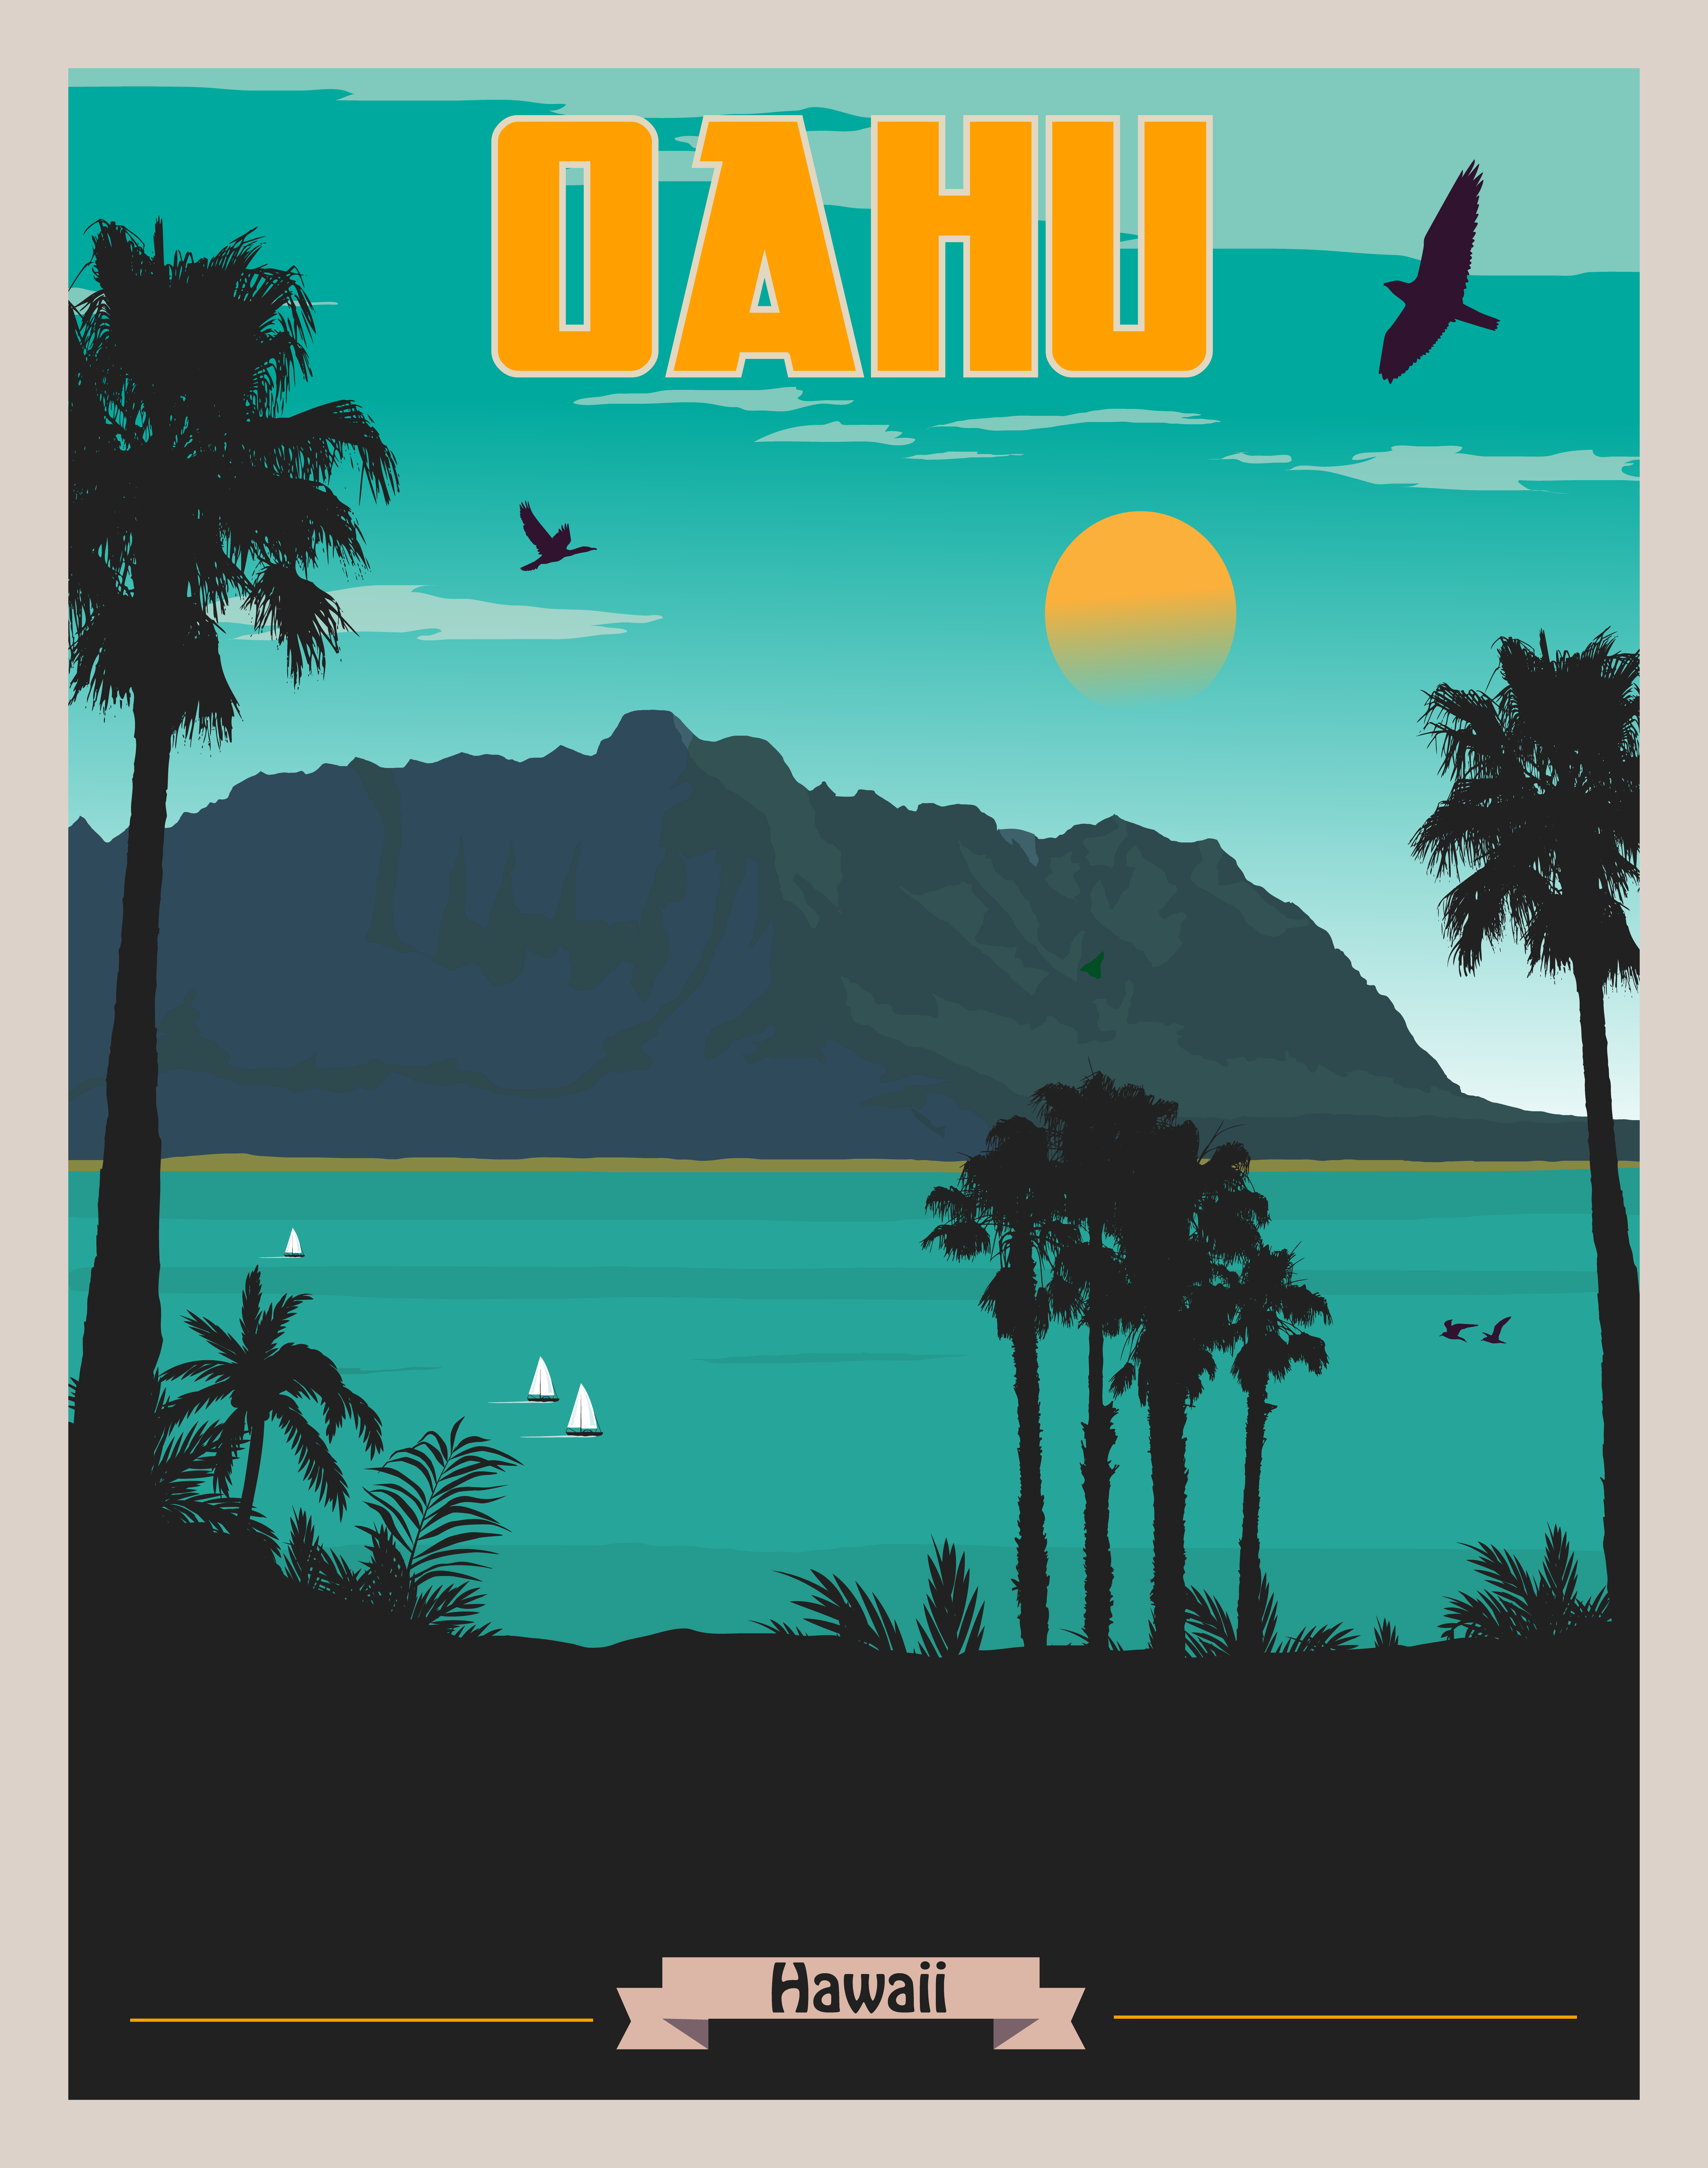 Oahu Hawaii Vintage Style Travel Posters